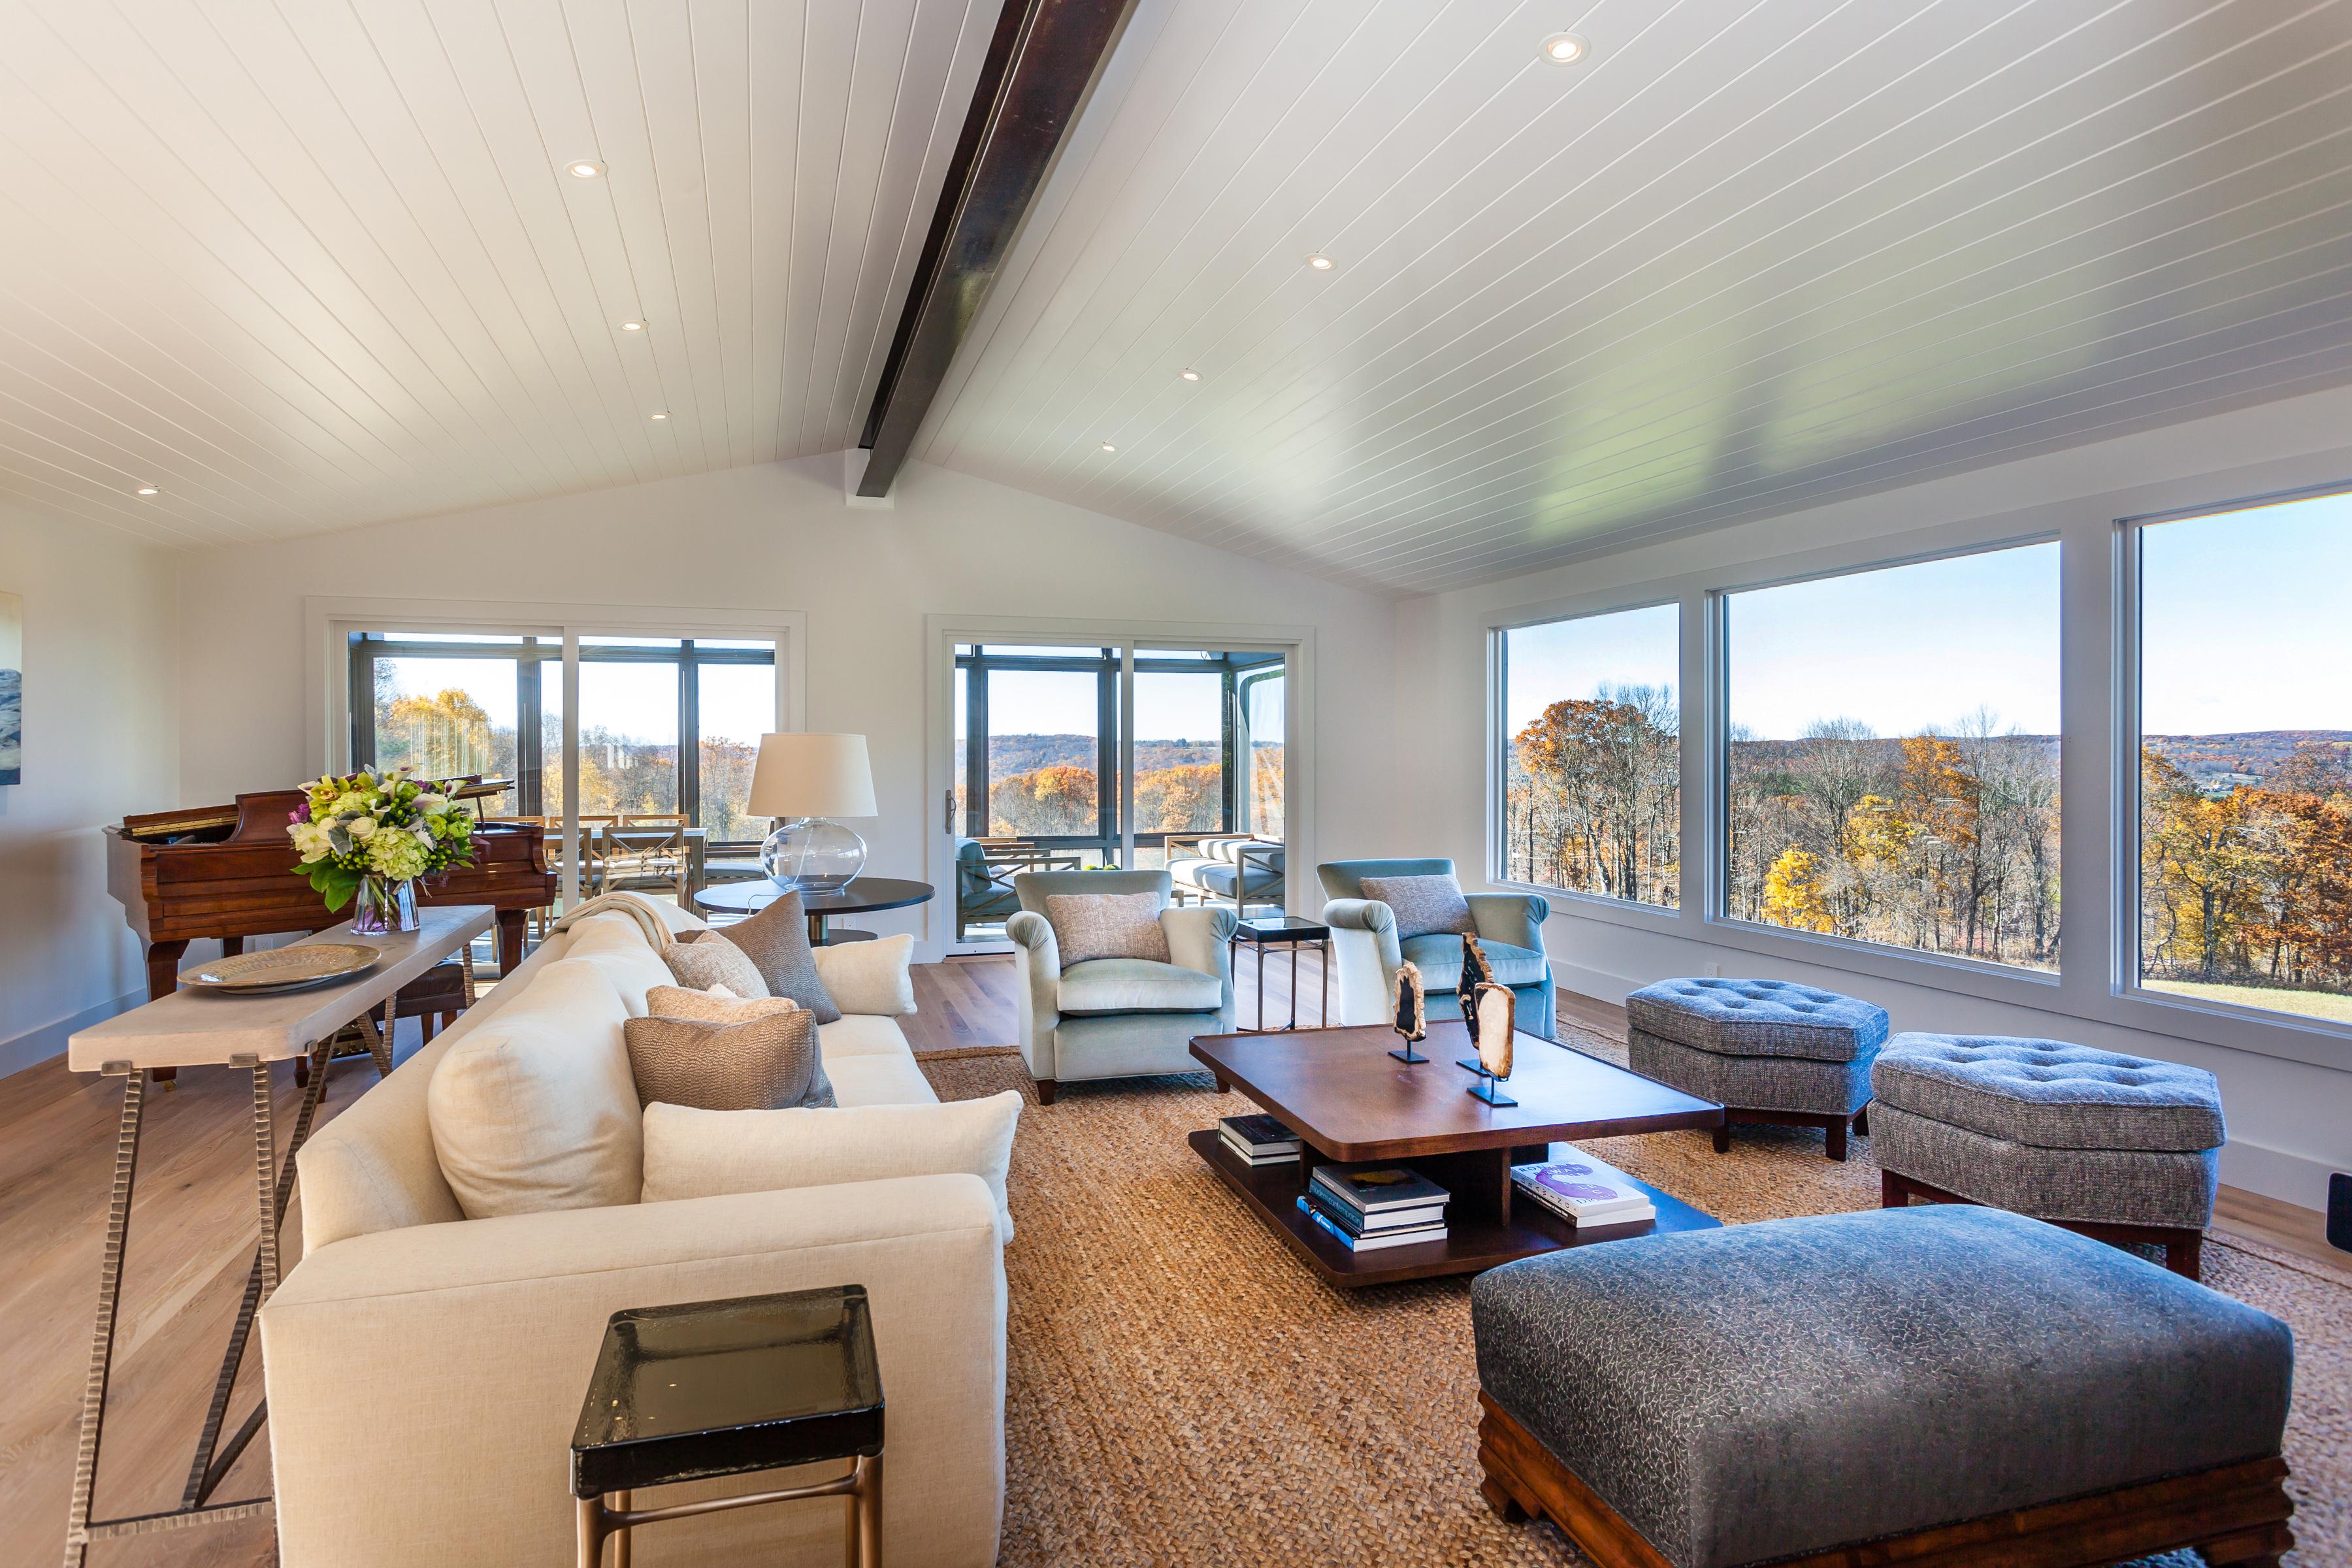 Condominium for Sale at THE SUITES AT WYKEHAM RISE 101 Wykeham Rd 3-19 Washington, Connecticut, 06793 United States